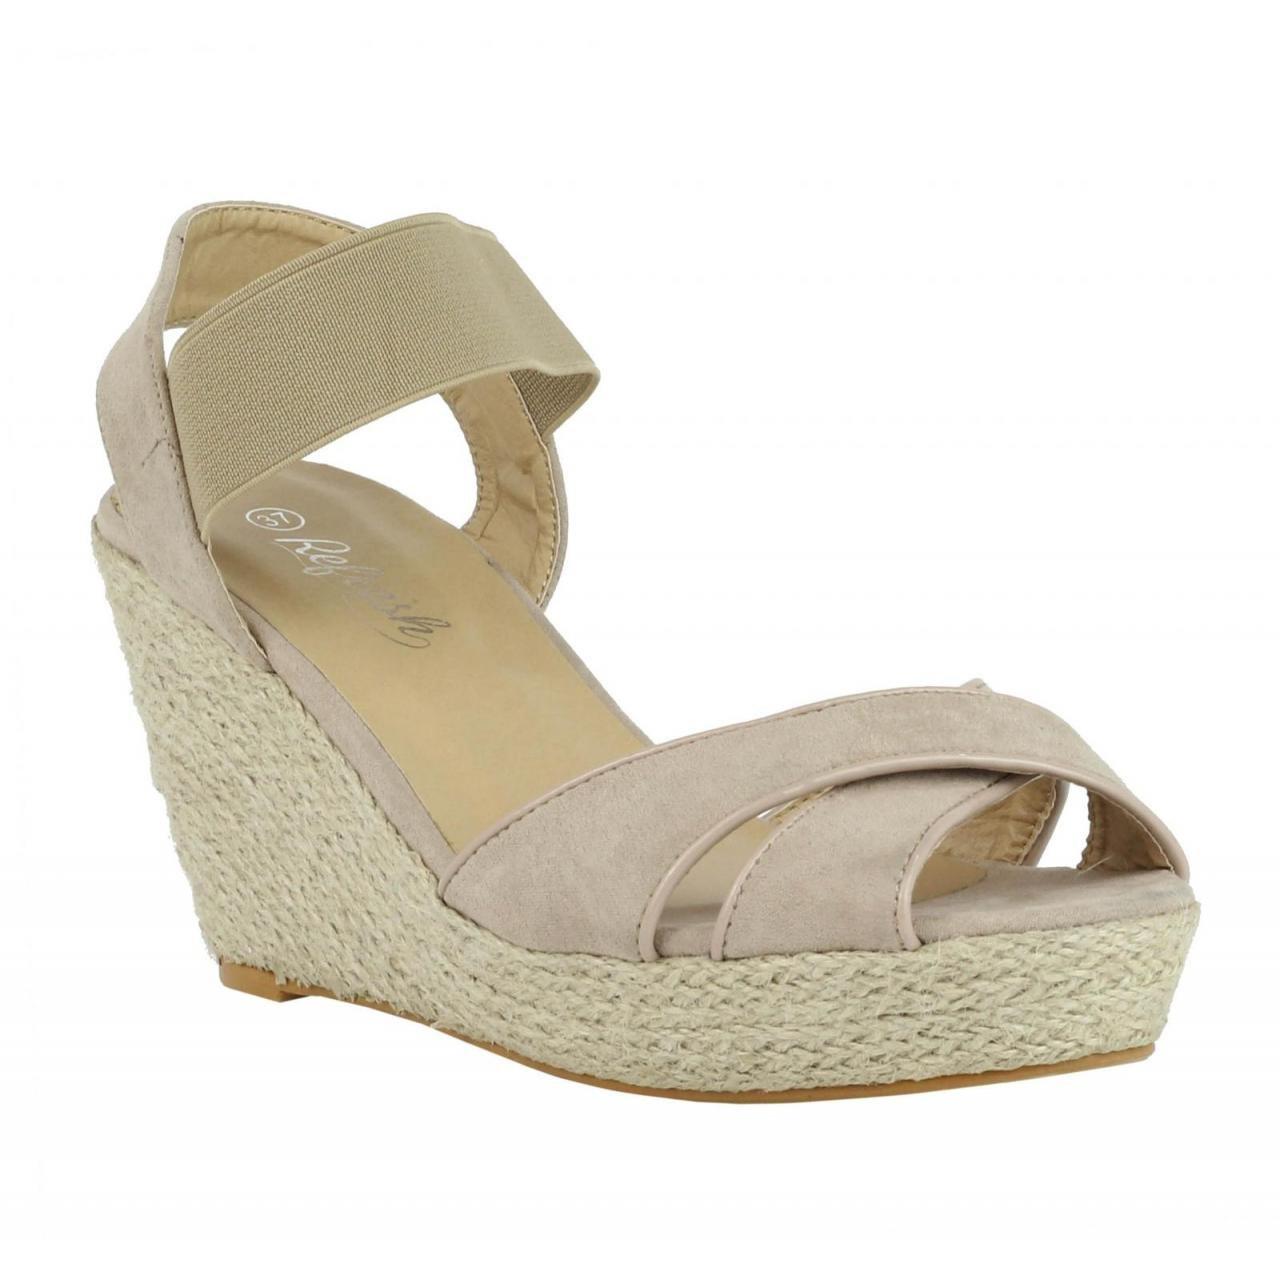 Refresh Schuhe Keilabsatz für Damen 61953 ANT Nude Nude Nude 53ce9b